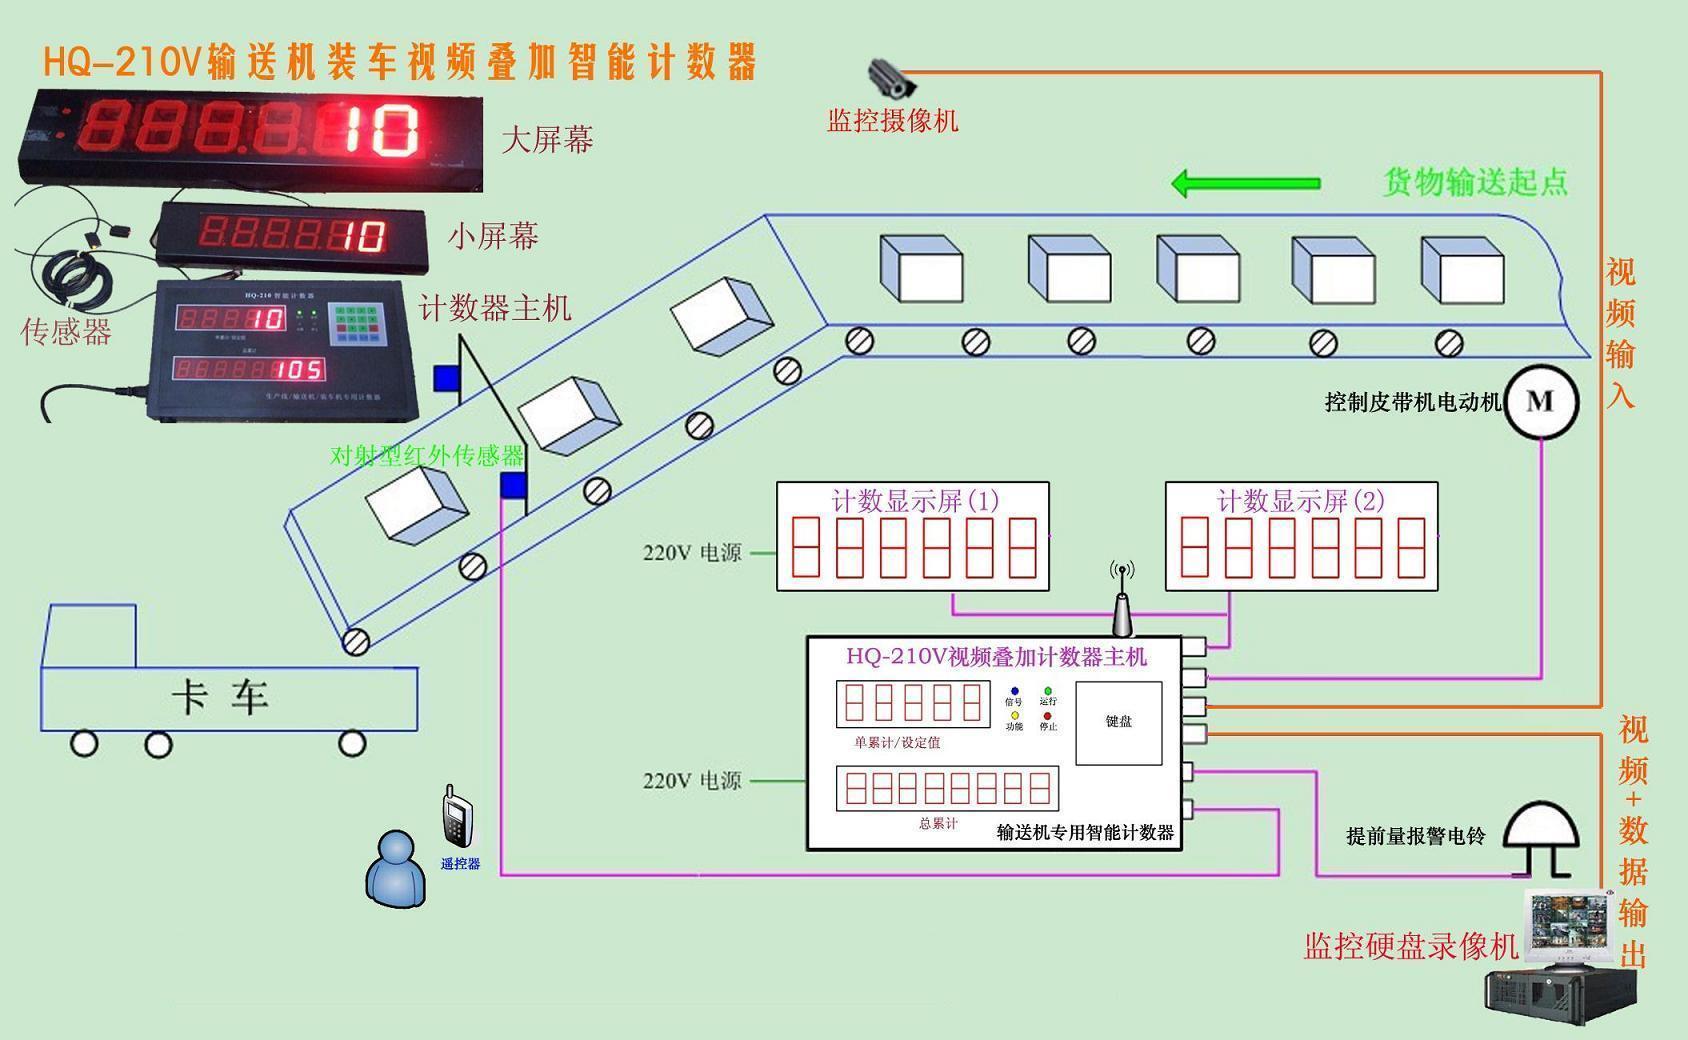 HQ-210智能计数器是我公司针对屠宰流水作业专门研发的一款智能计数系统。本产品采用全进口汽车级集成芯片精确控制;性能稳定、显示清晰、计数精确、具有断电不丢数超长时间记忆功能,易安装,易操作,防水的特点,适合于恶劣的环境。HQ-210智能计数器是由CPU芯片智能分析处理,能有效防止家禽在宰杀悬挂运输过程中的摆动问题,产品不规则问题,完全有效的保证了计数准确,适用于大型自动化屠宰场对鸡、鸭、鹅、猪、牛、羊等宰杀畜、禽的计数。